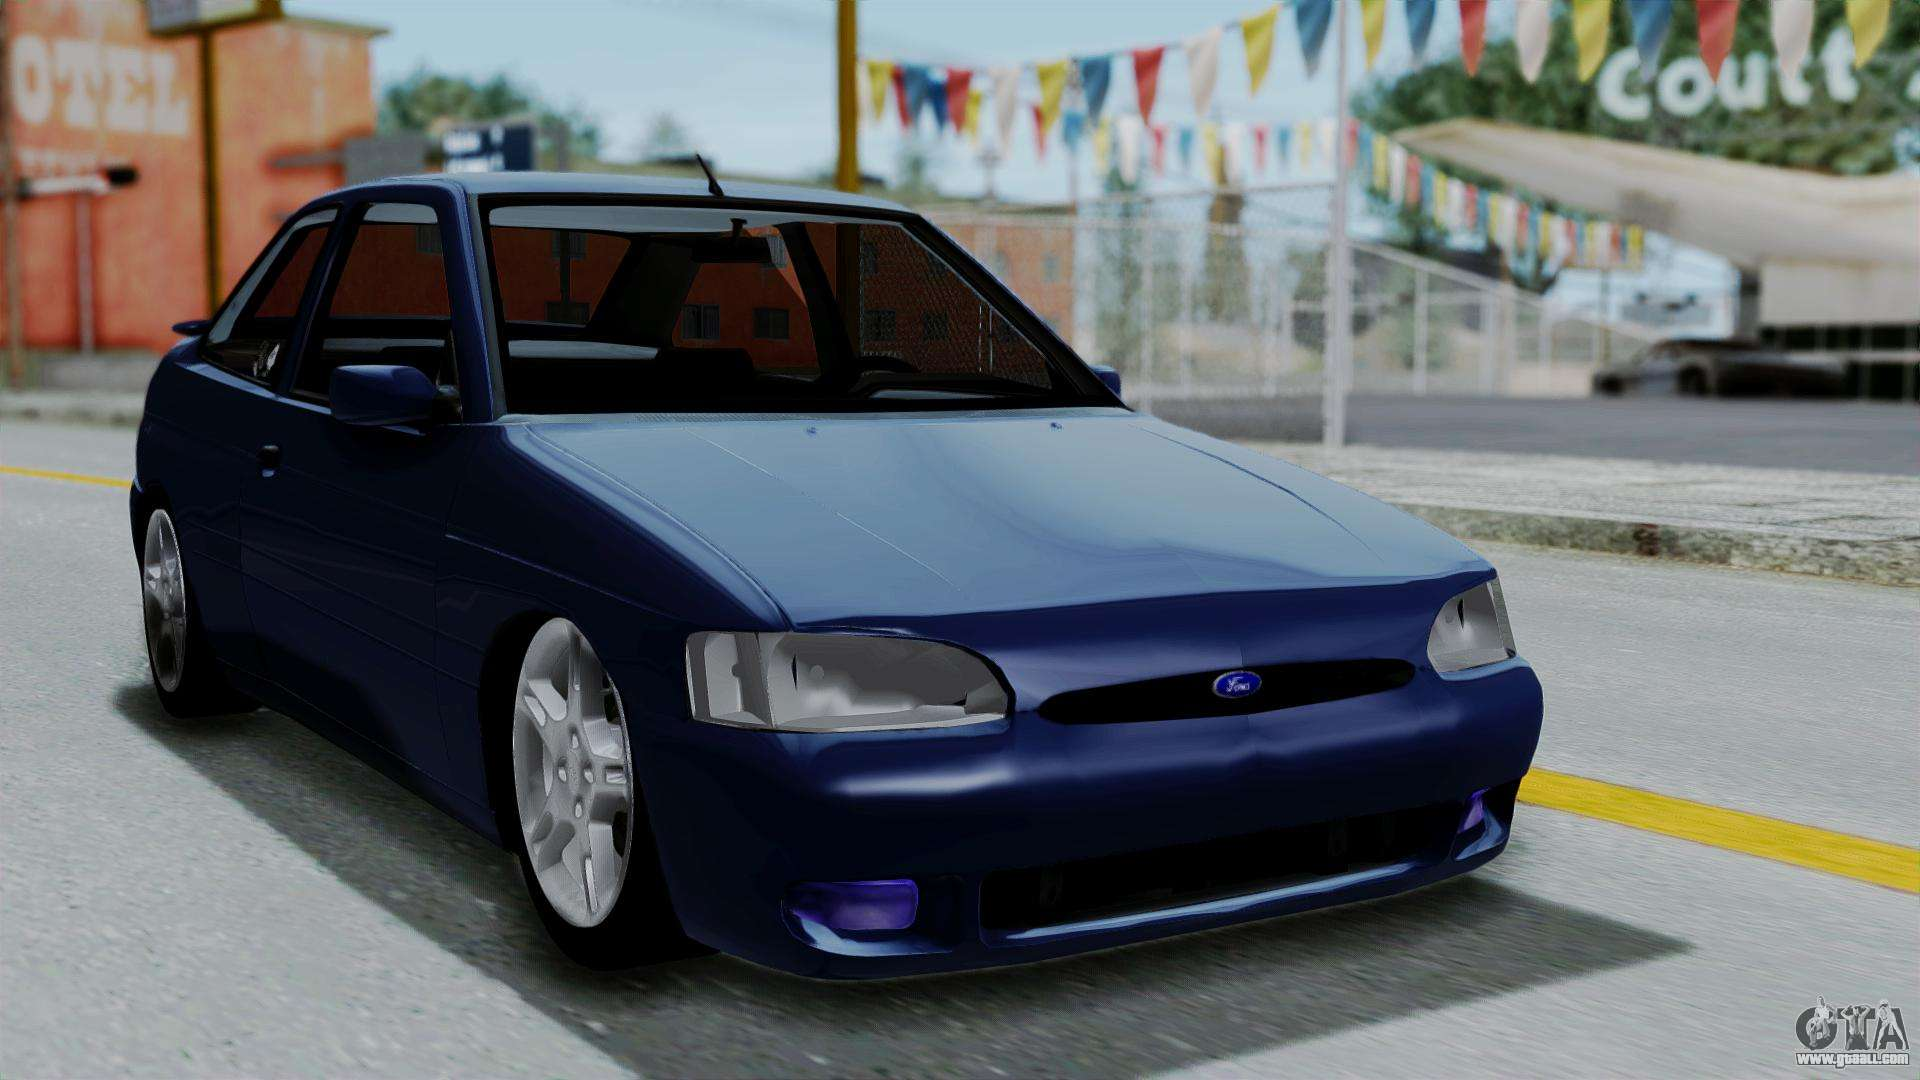 Ford escort gts